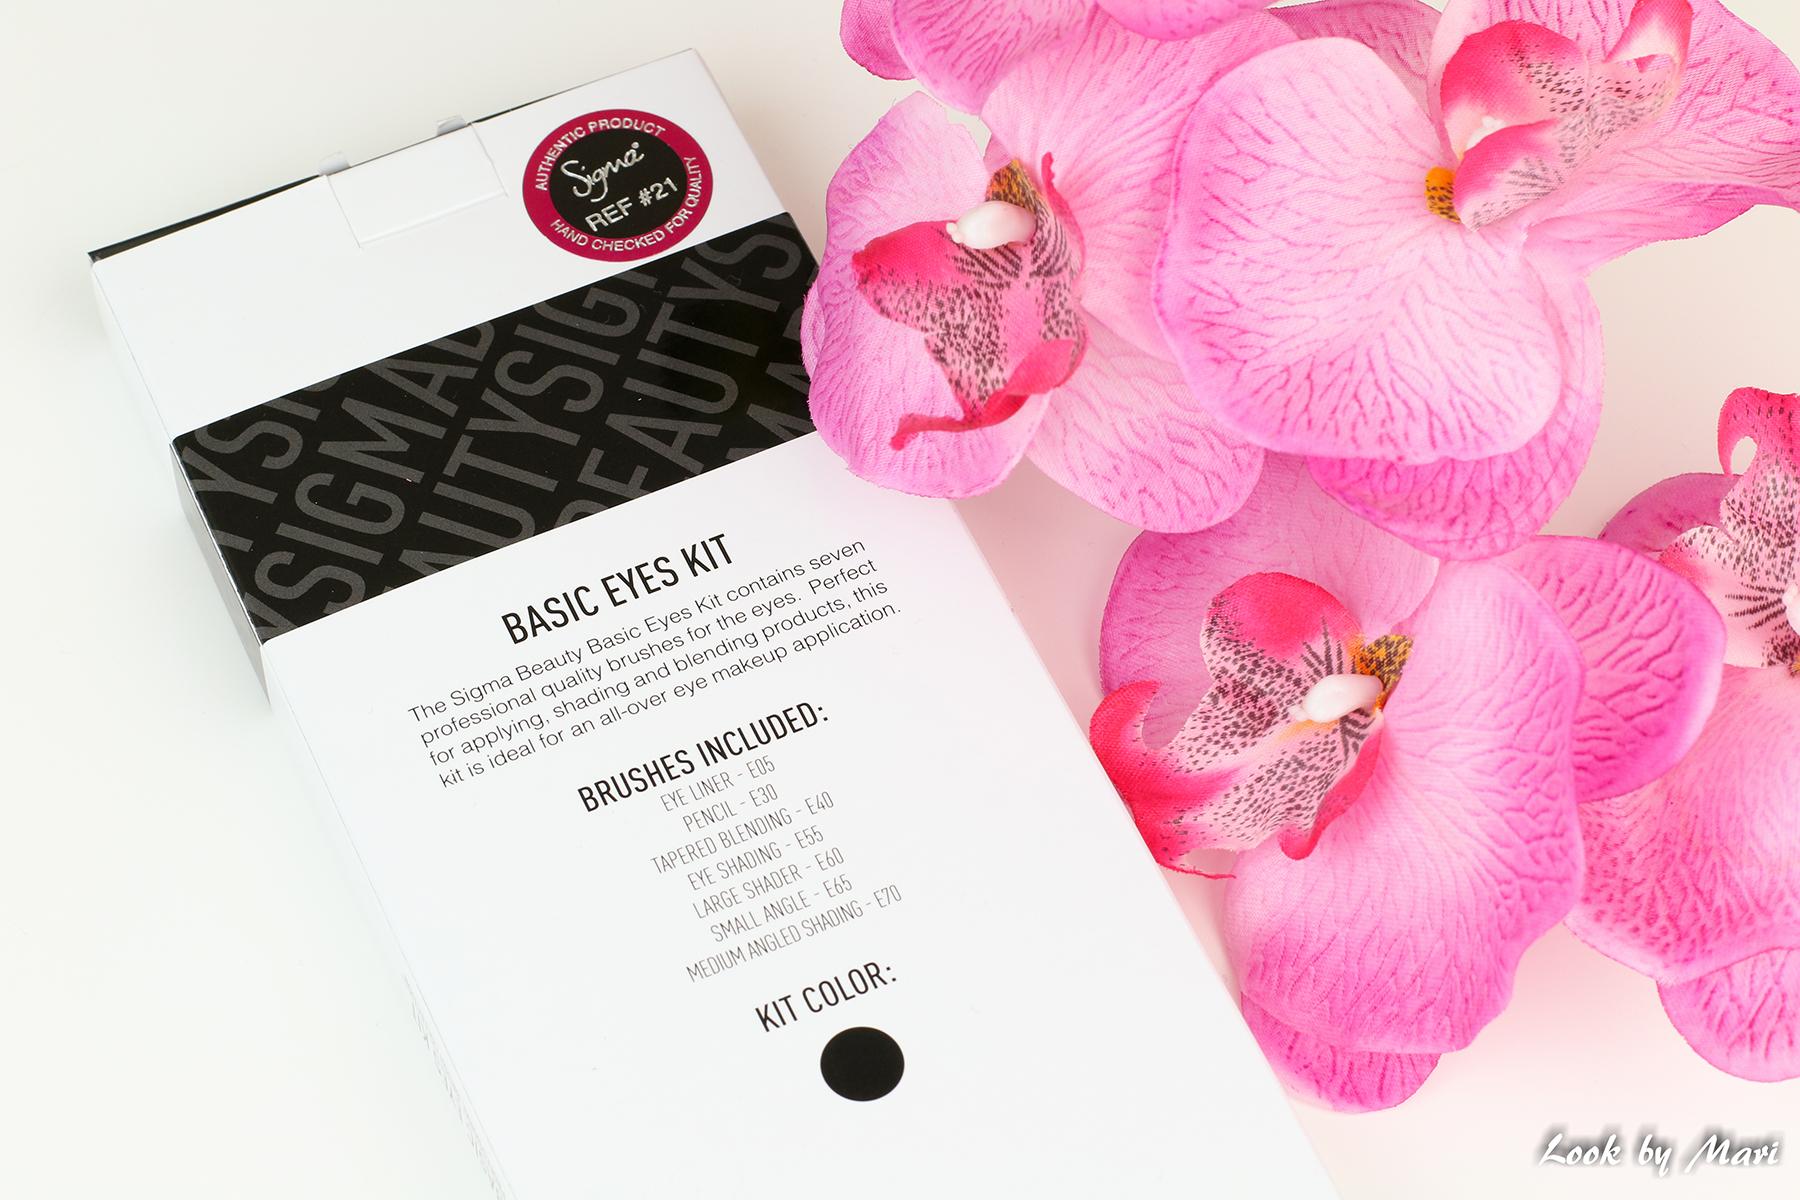 3 eleven.fi eleven.se sigma beauty prices review kokemuksia hinnat